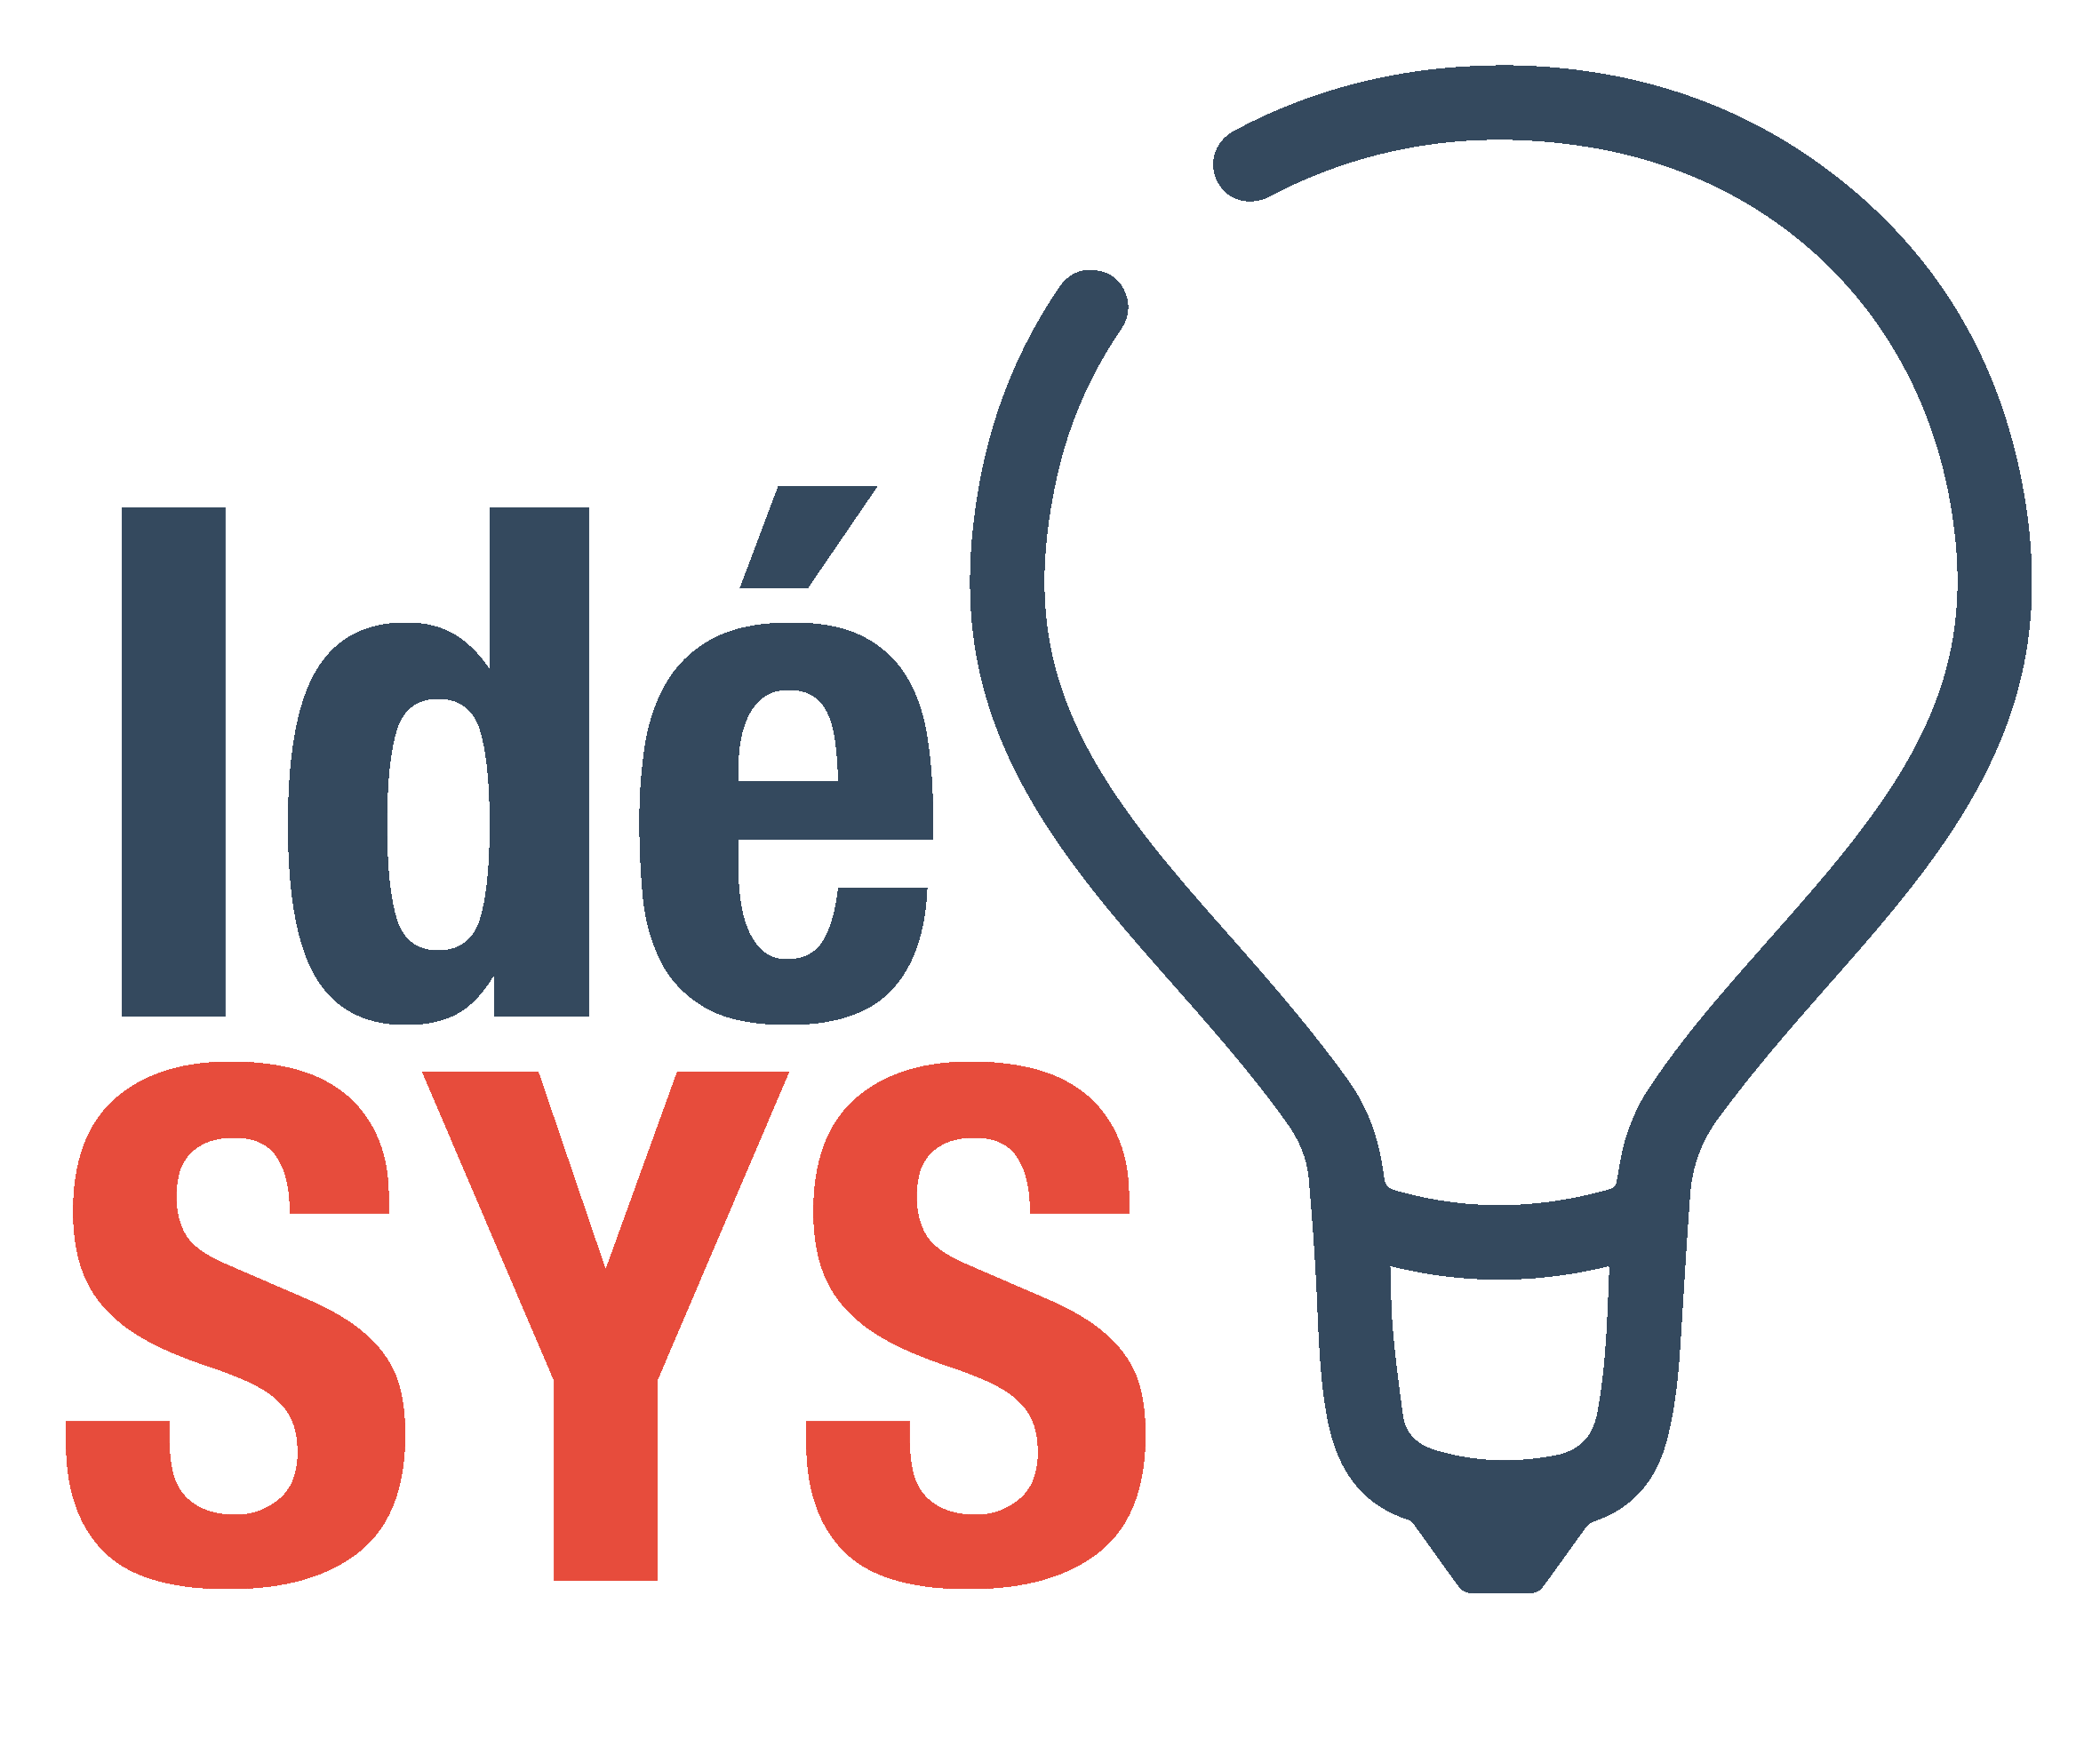 logo_idesys